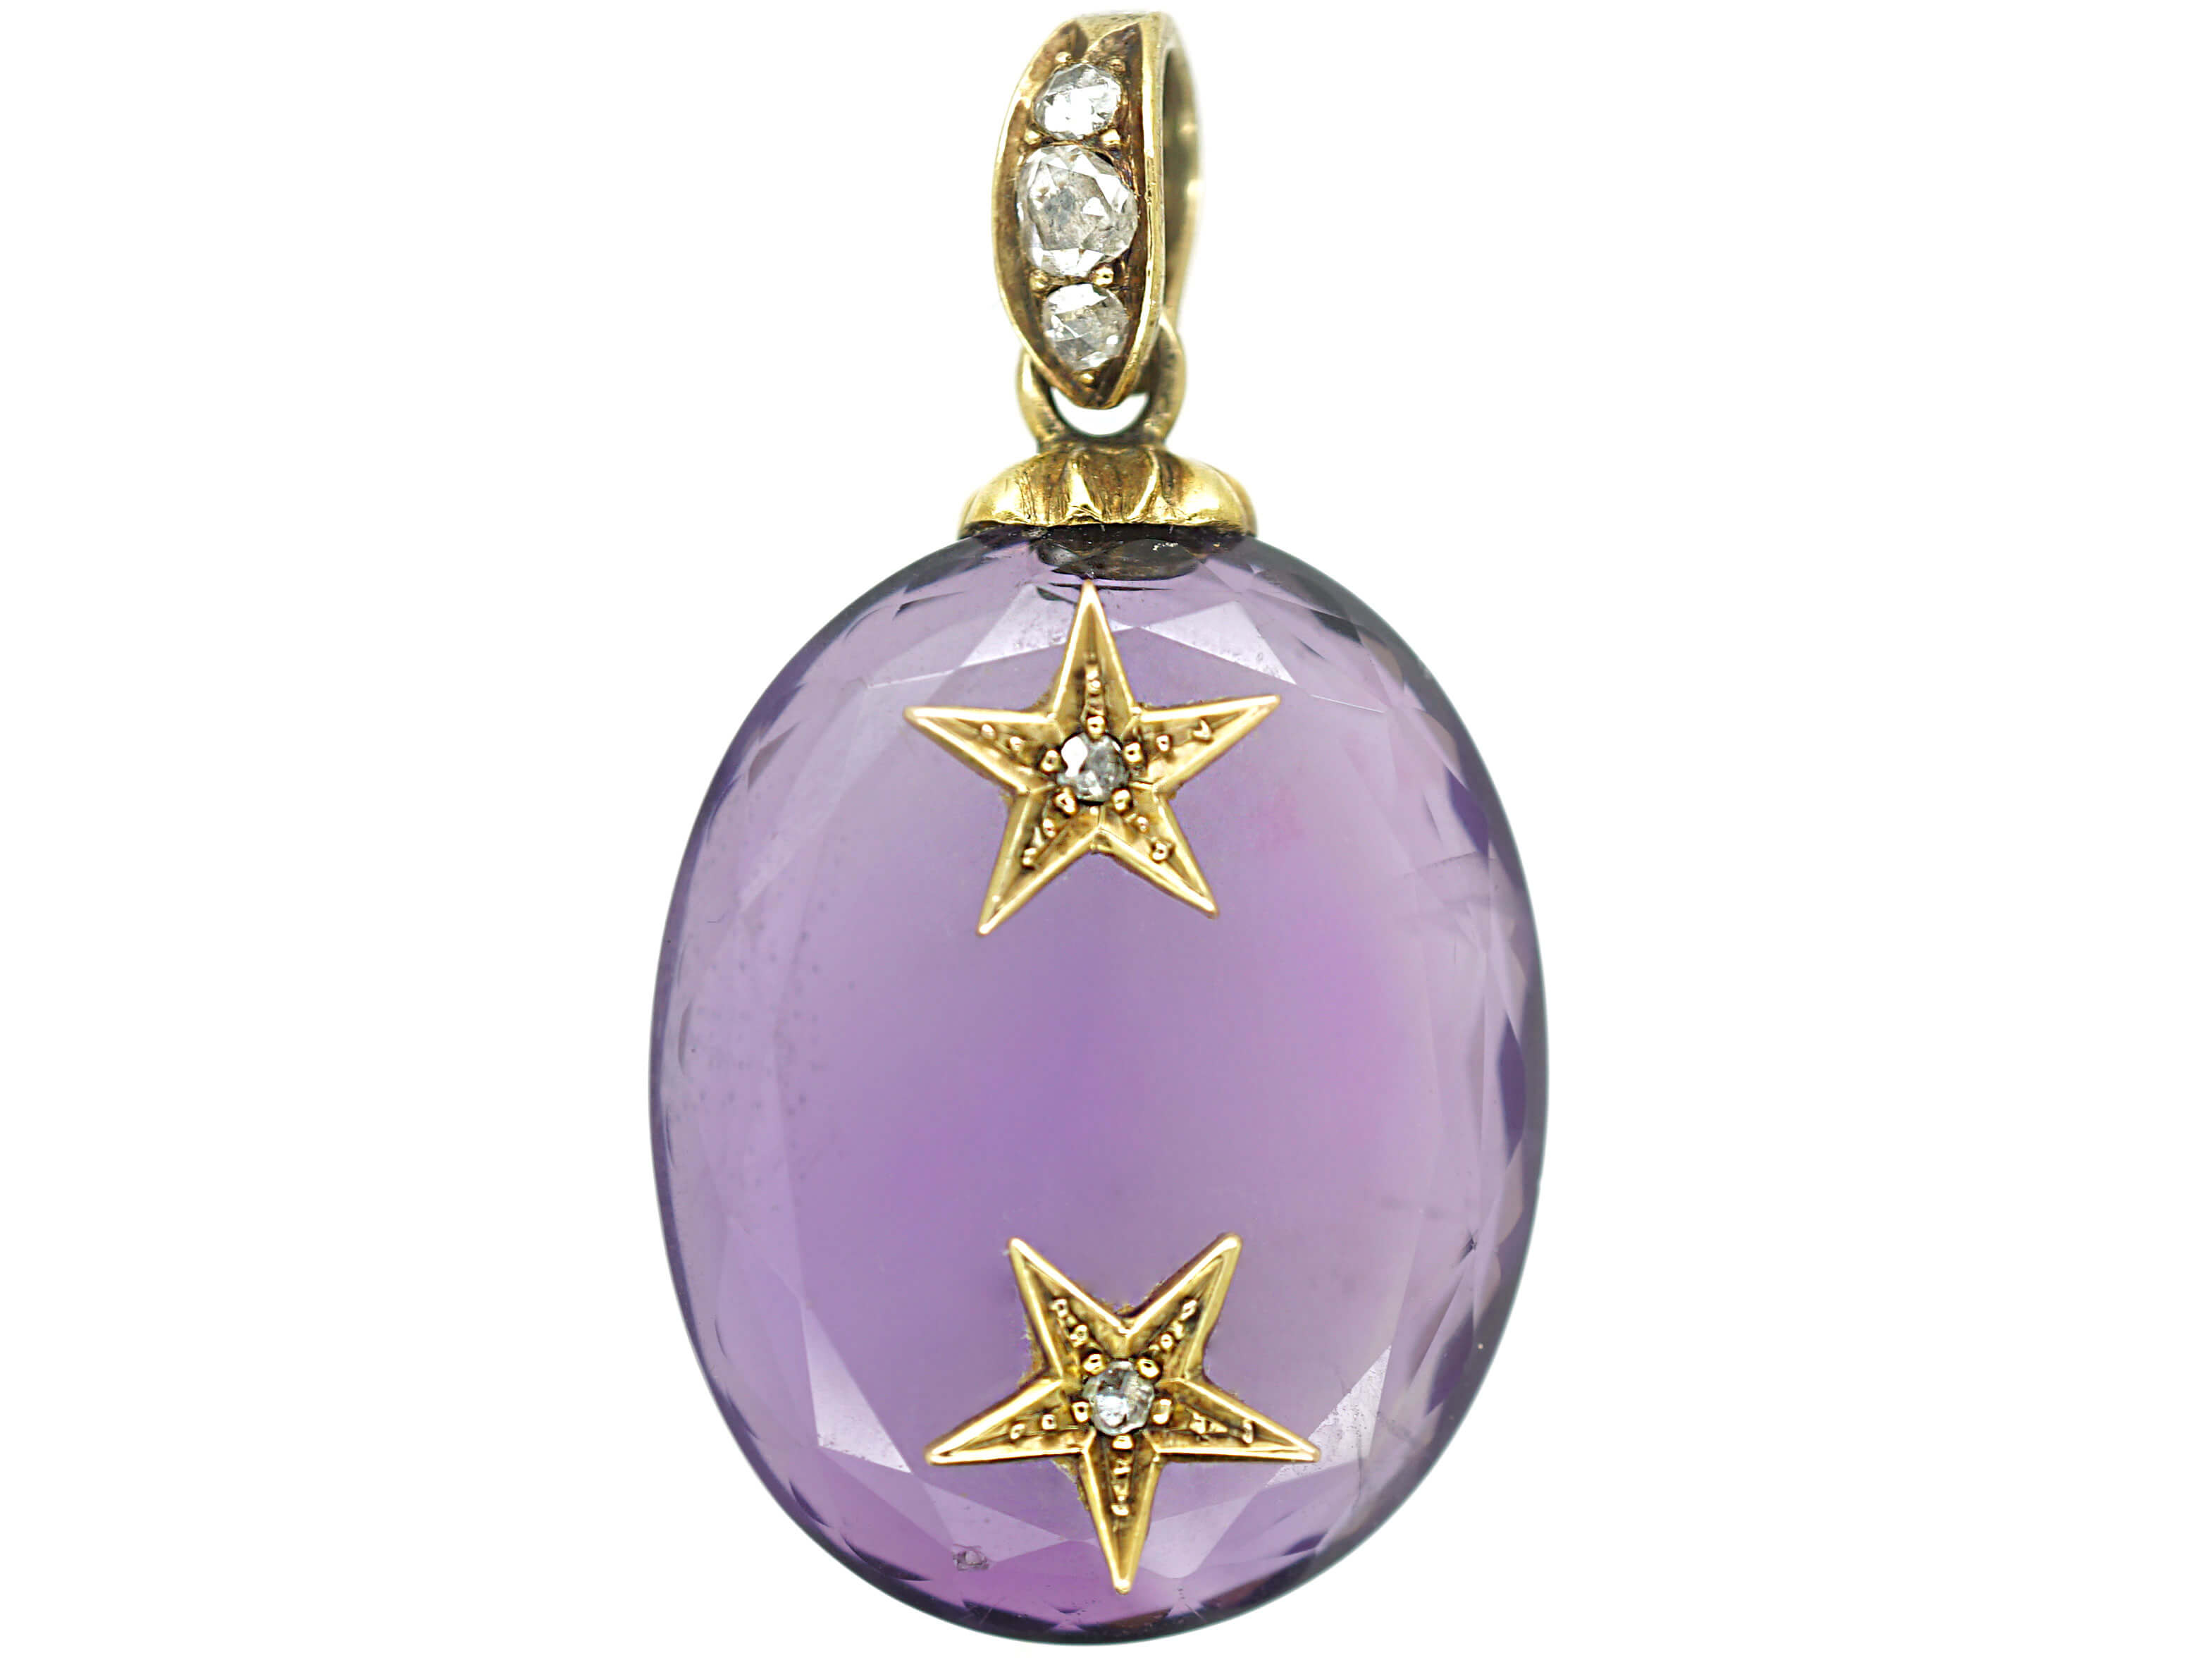 Victorian Oval Amethyst Pendant set with Two Rose Diamond Stars with Diamond Set Bale